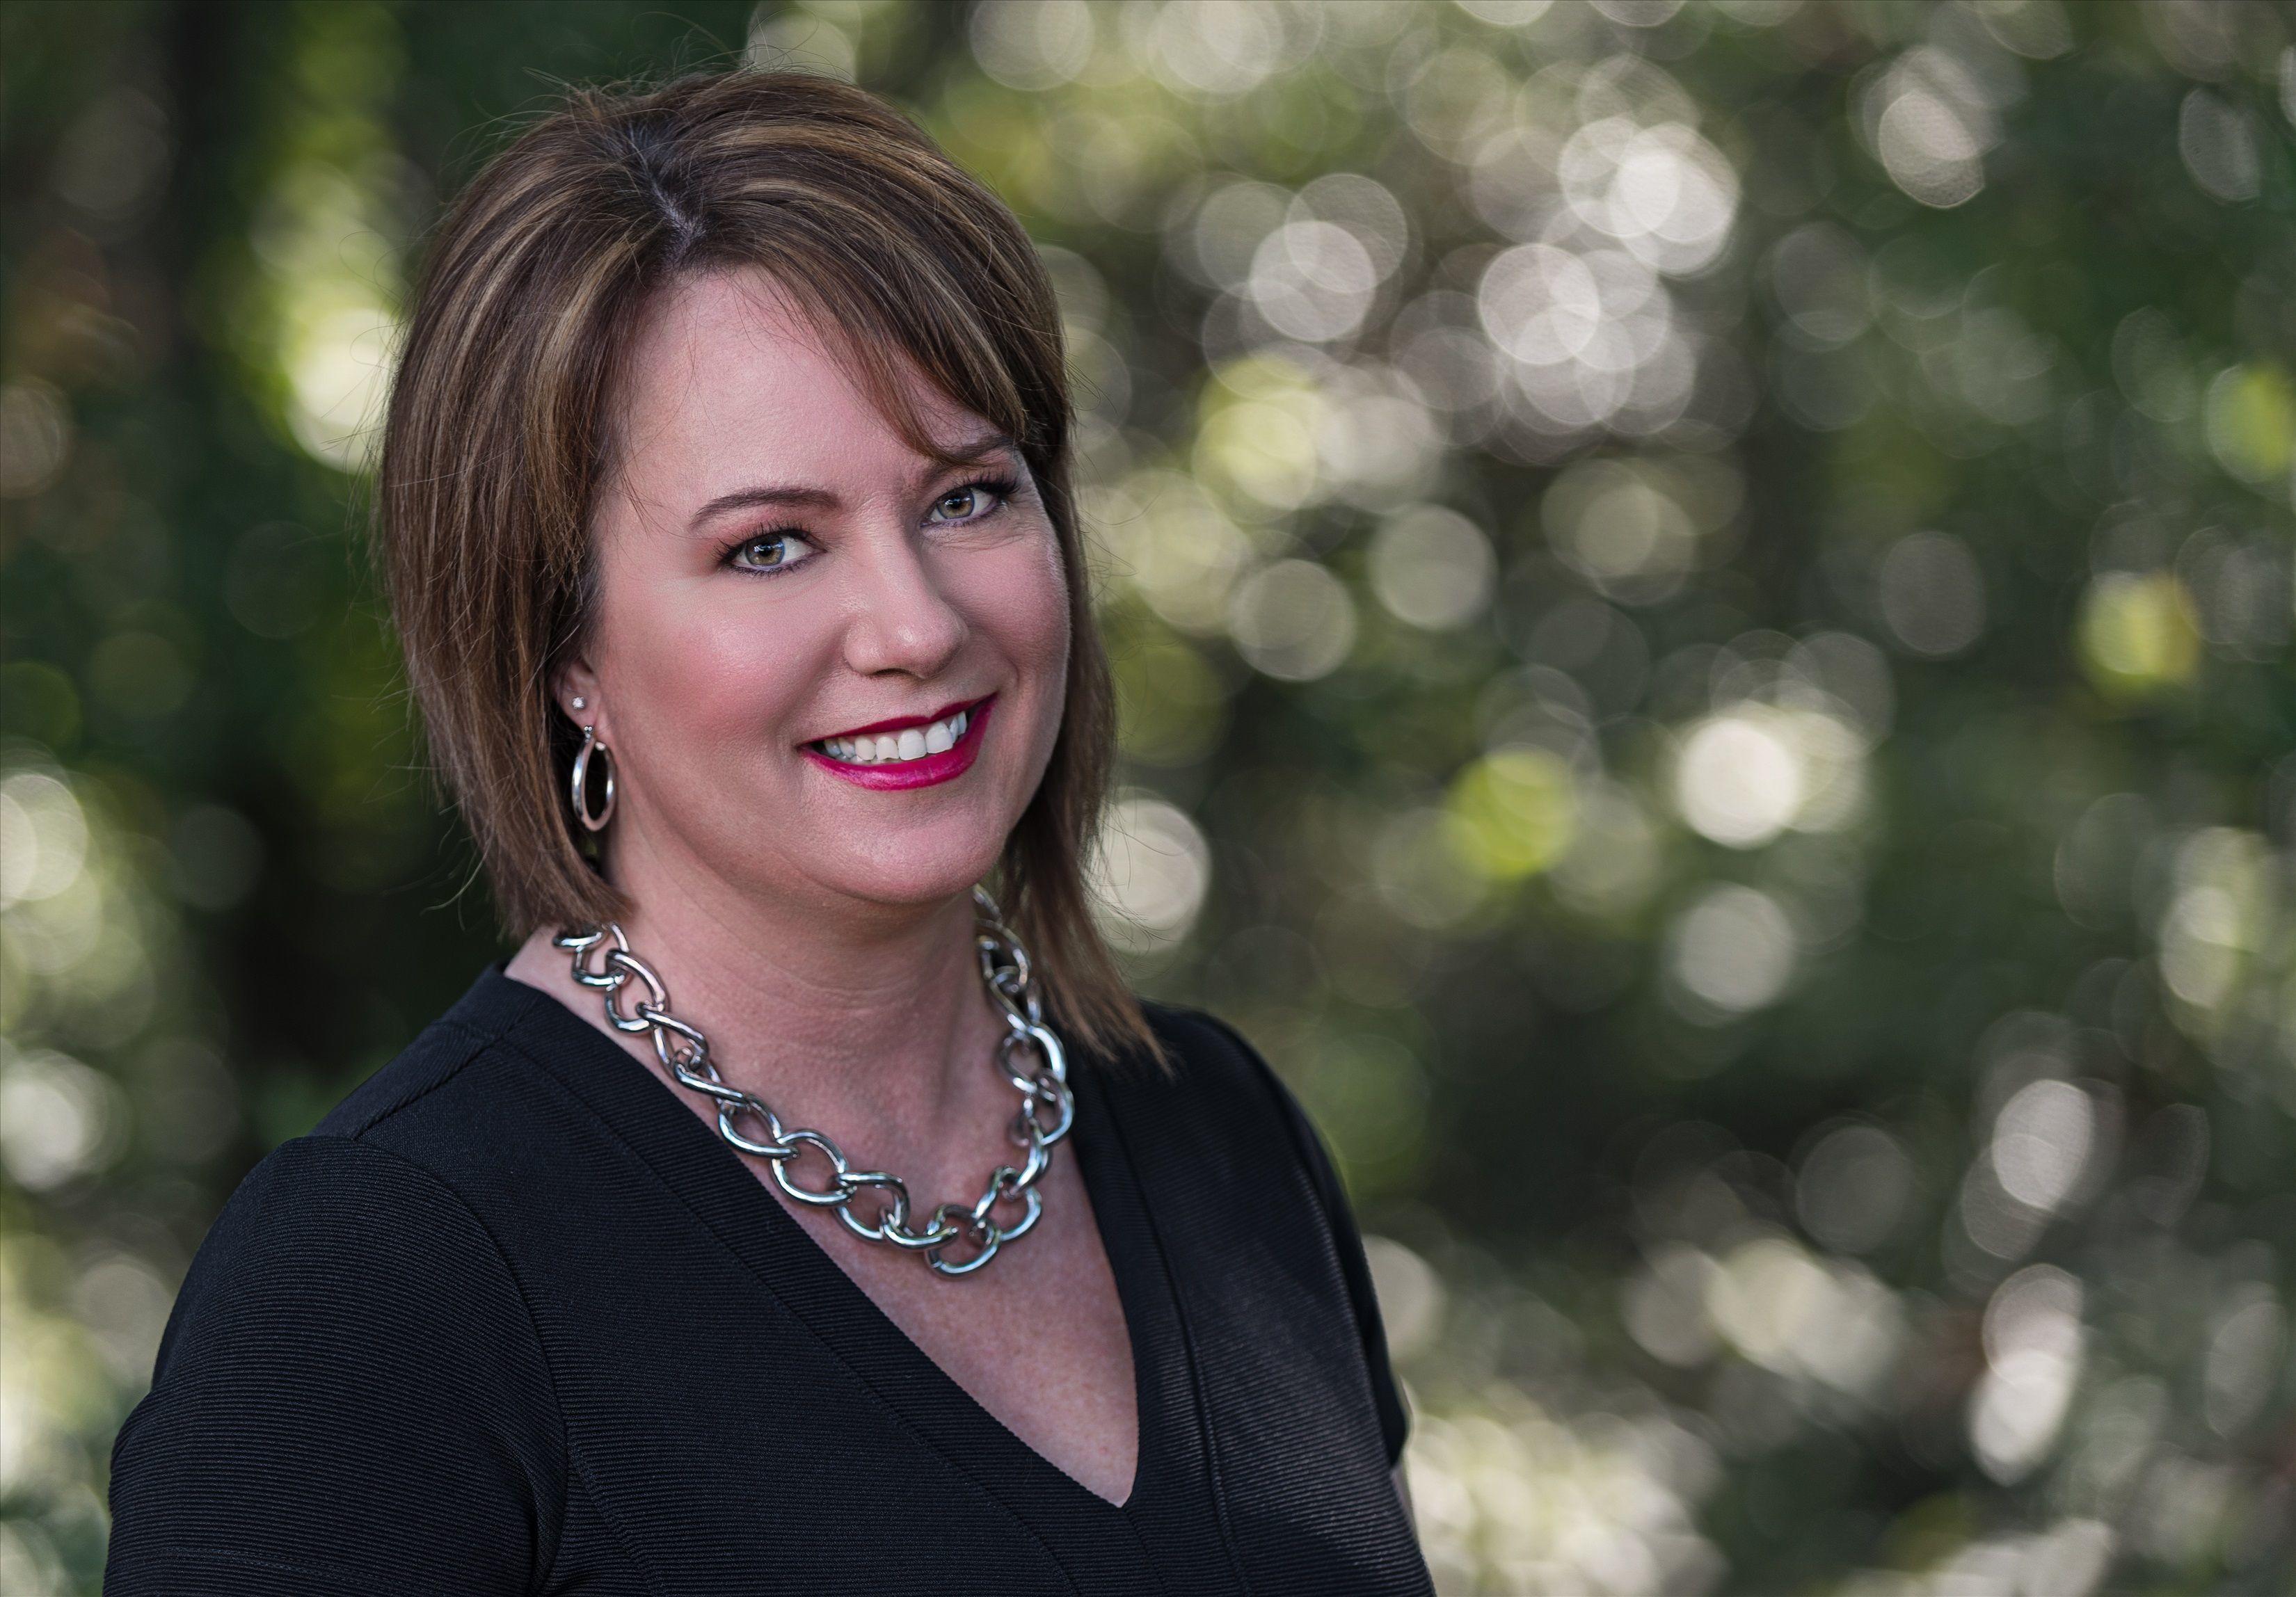 Kim C WOMEN ING TOGETHER NETWORKING NRH North Richland Hills